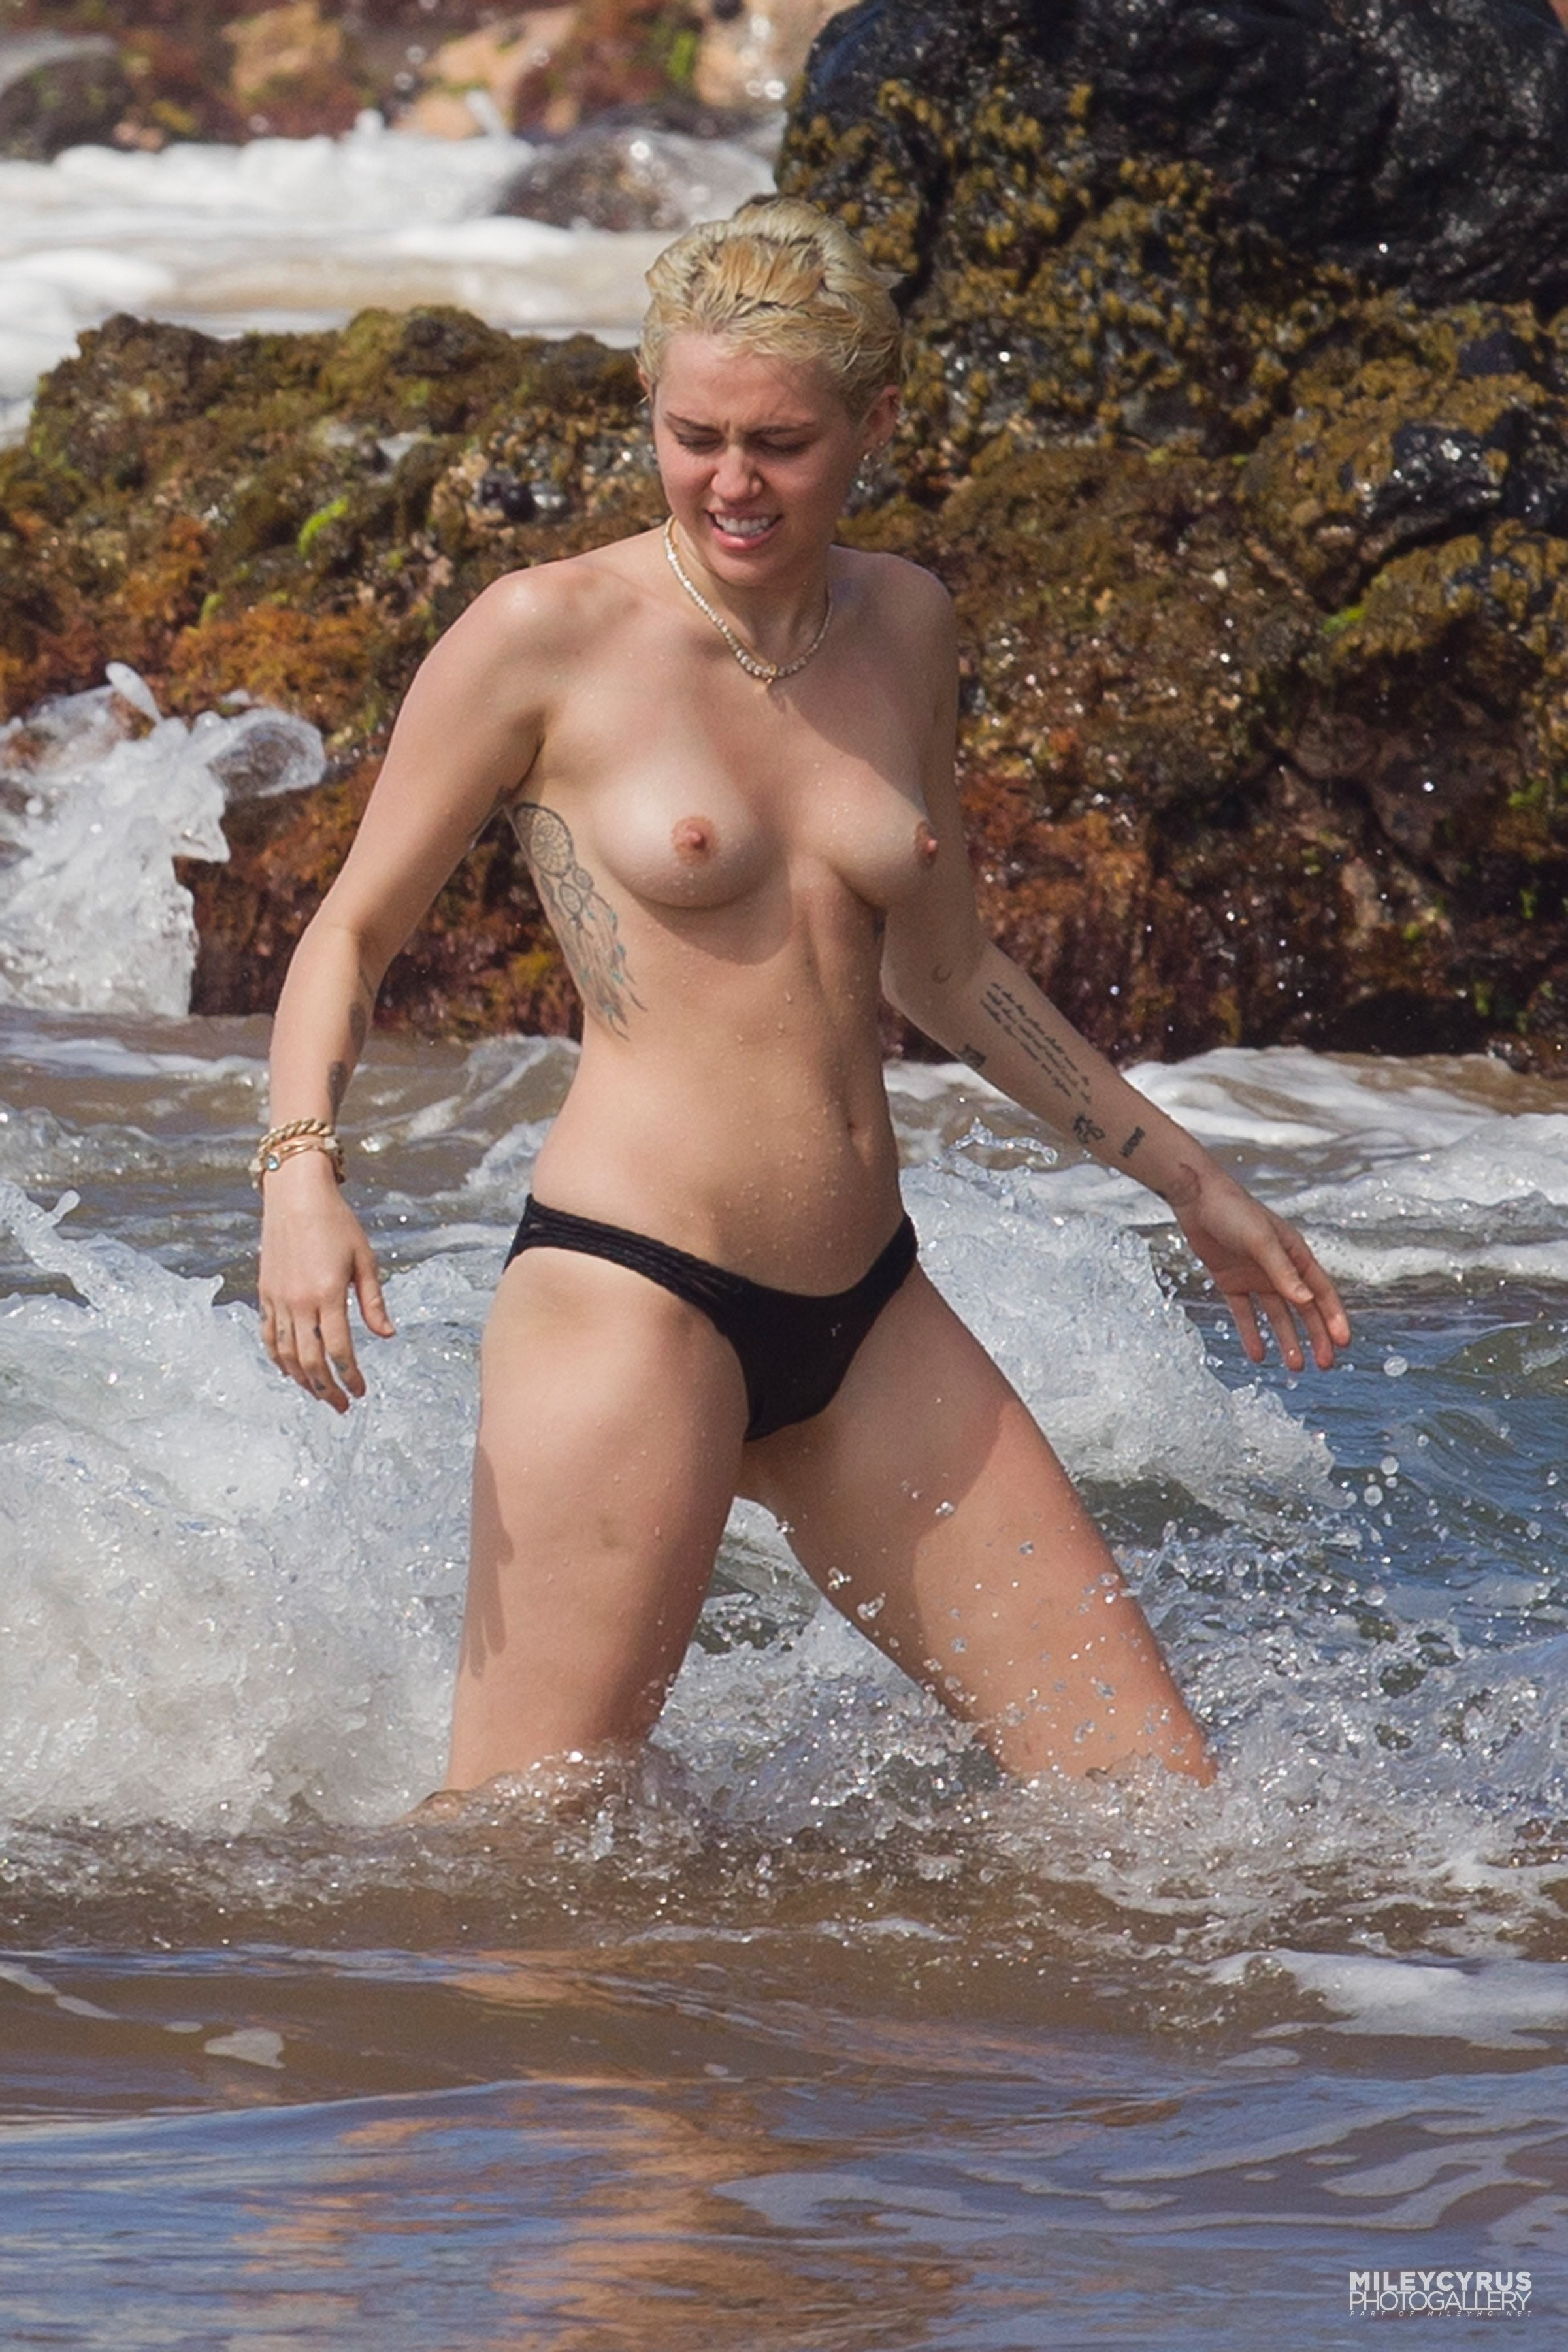 Farmington maine topless uncensored pictures, college dorm shower nudetures